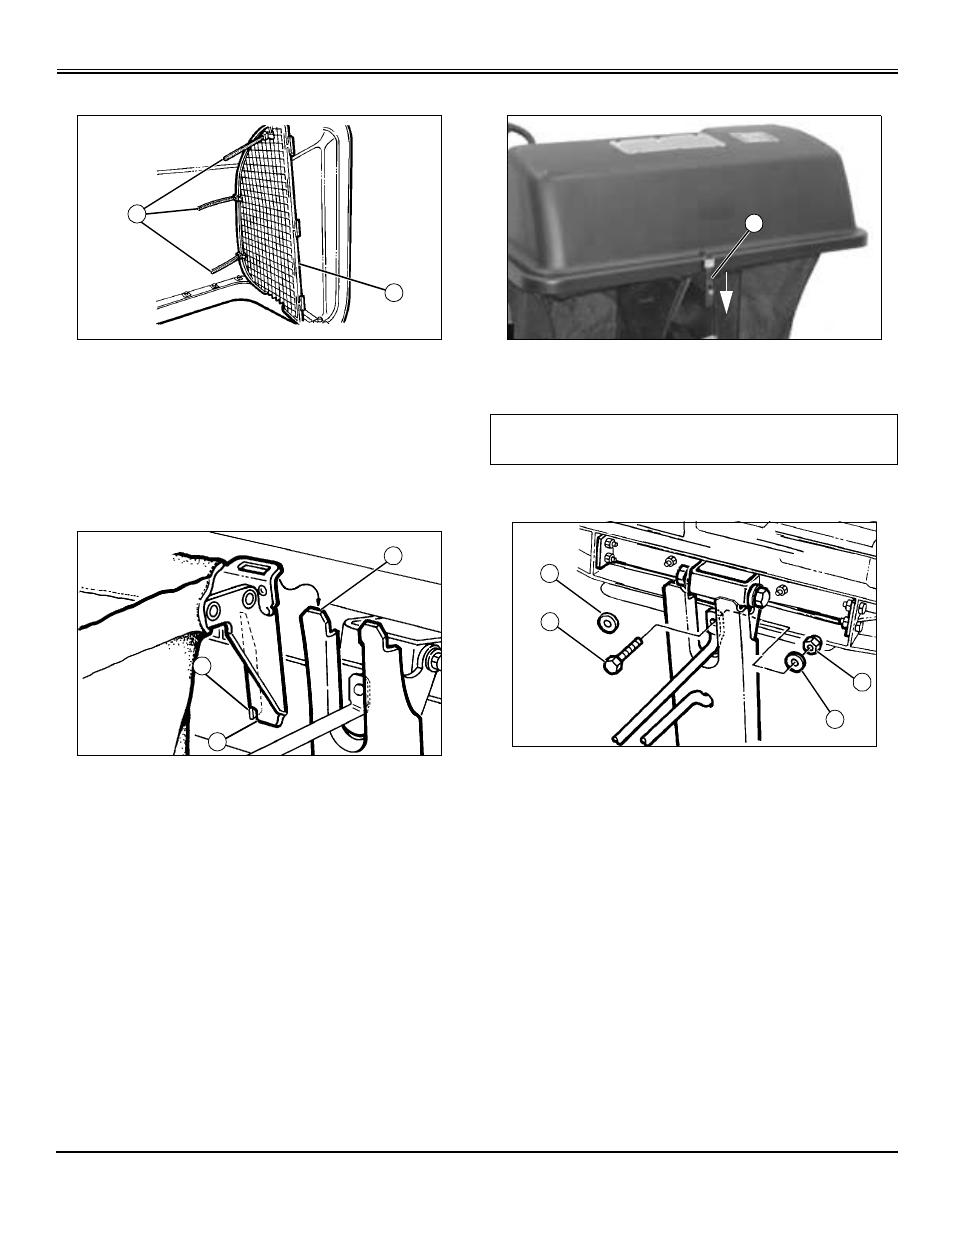 Install hopper screen, Install and adjust grass bags